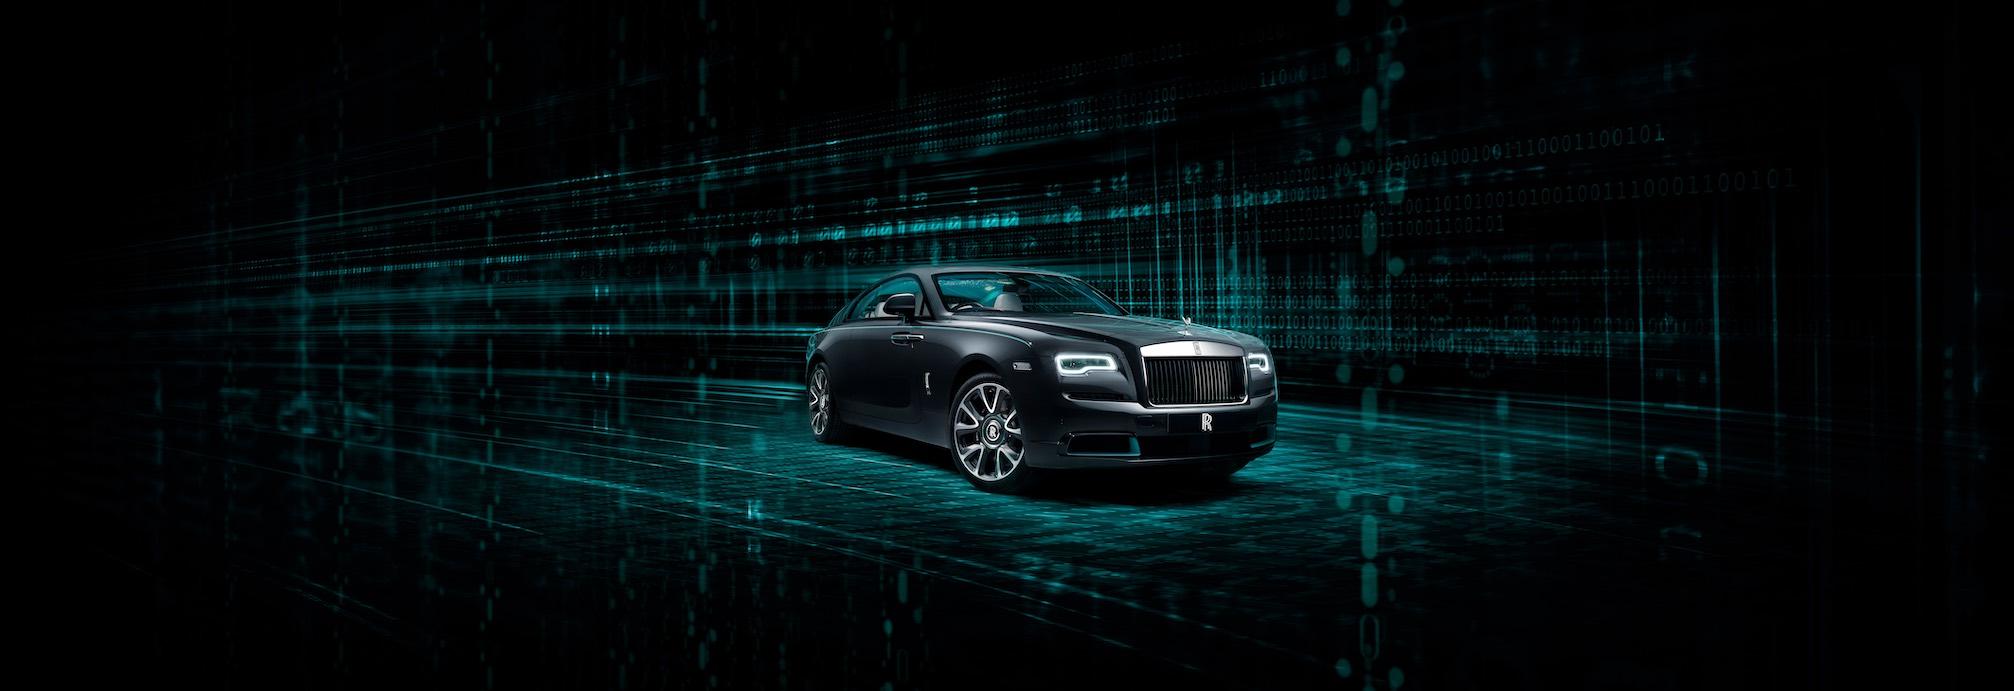 Introducing The New Rolls Royce Wraith Kryptos Collection